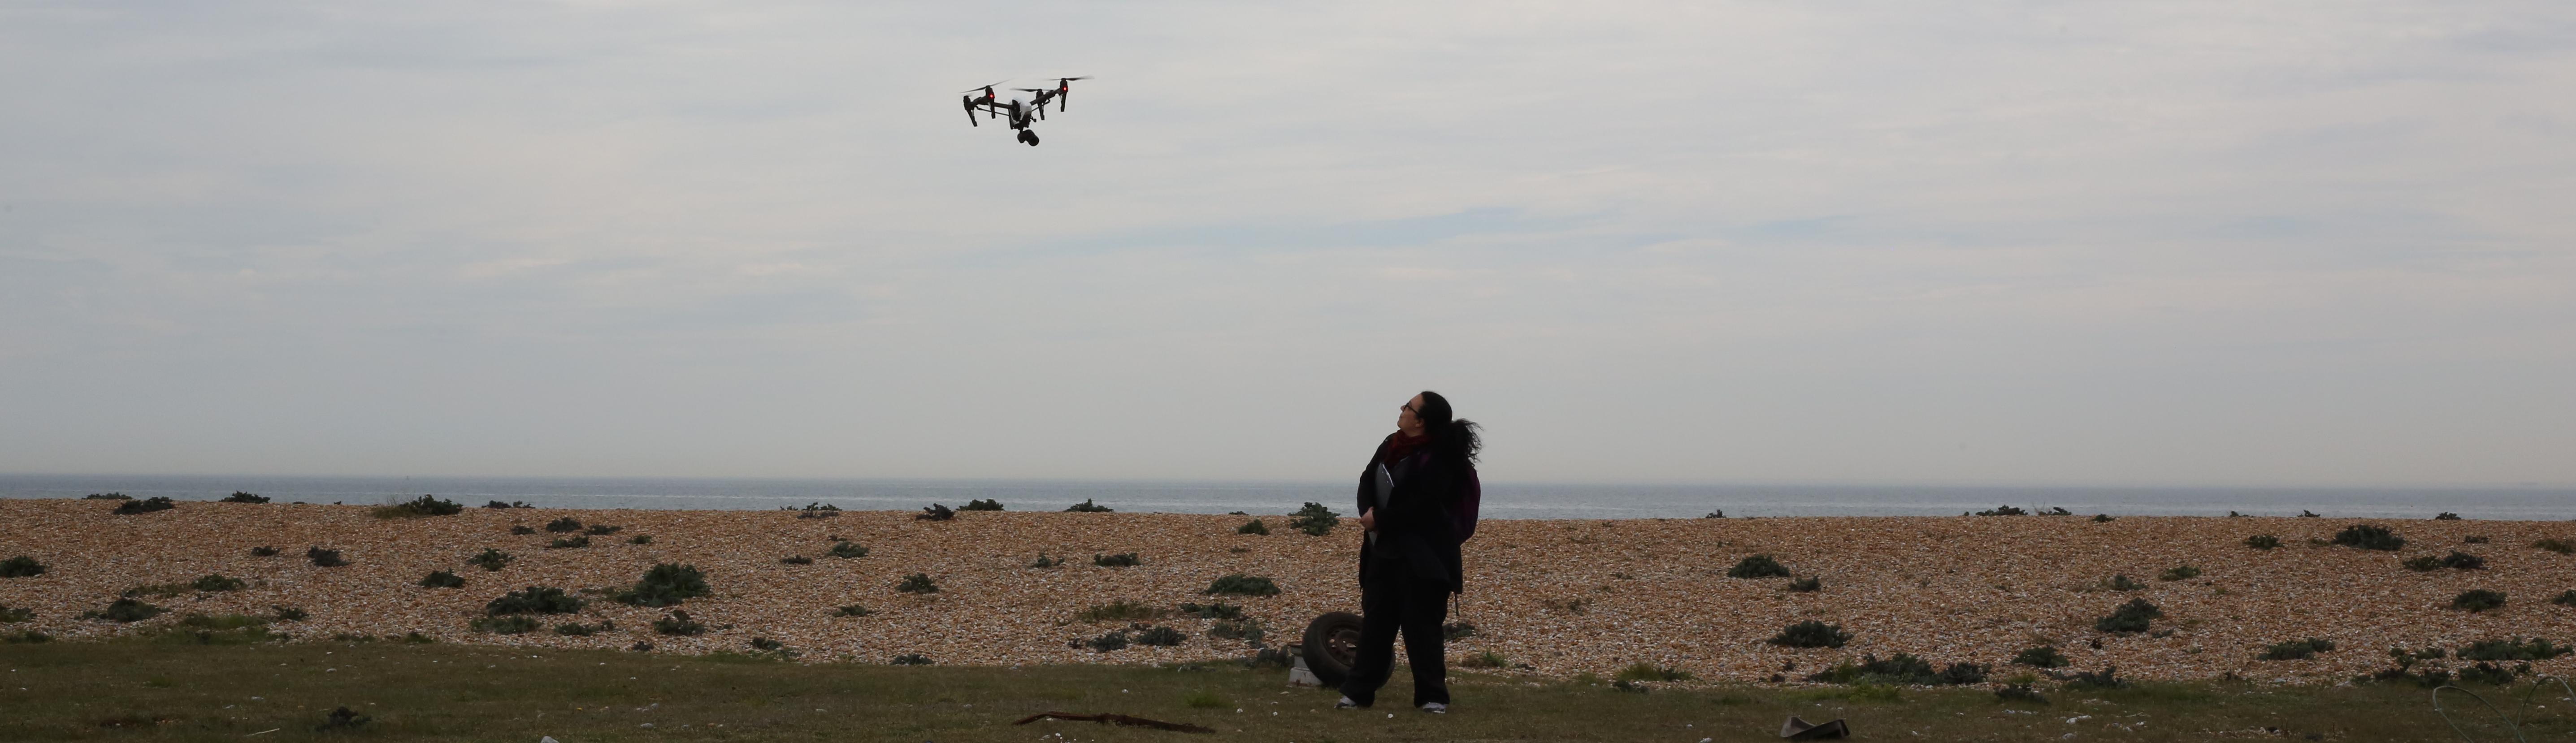 Annetta directs drone